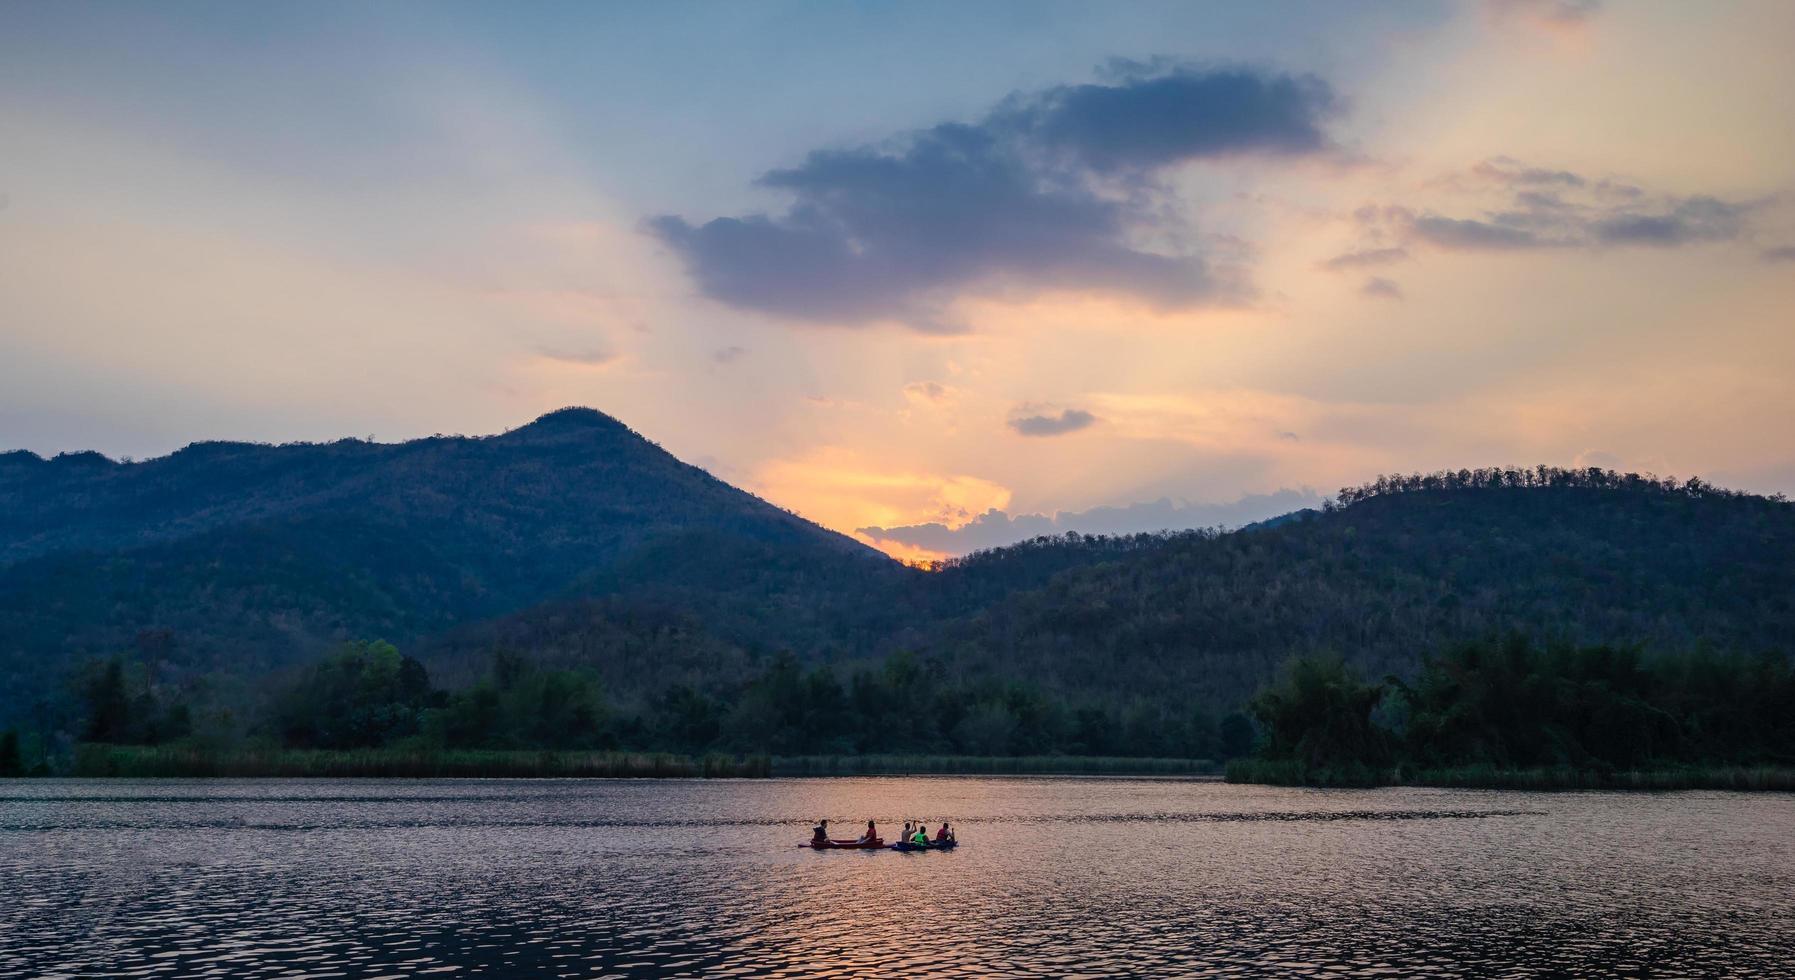 Kayaking down the river photo